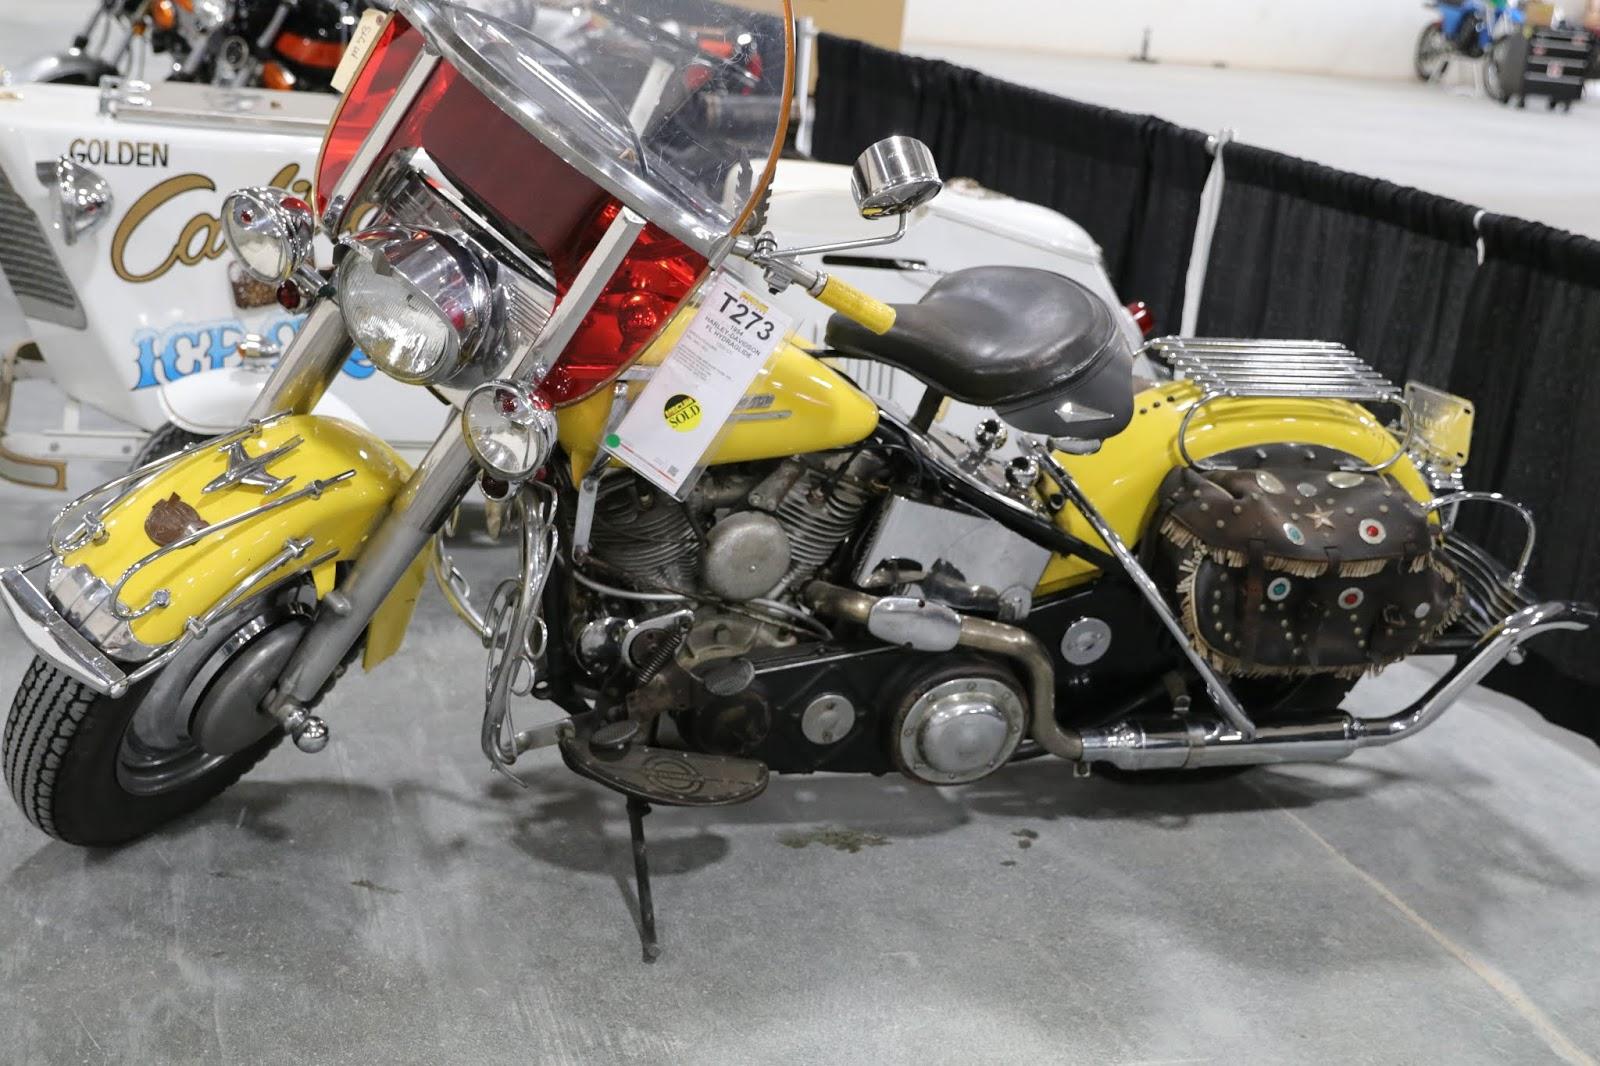 Oldmotodude 1954 Harley Davidson Hydraglide For Sale At The 2019